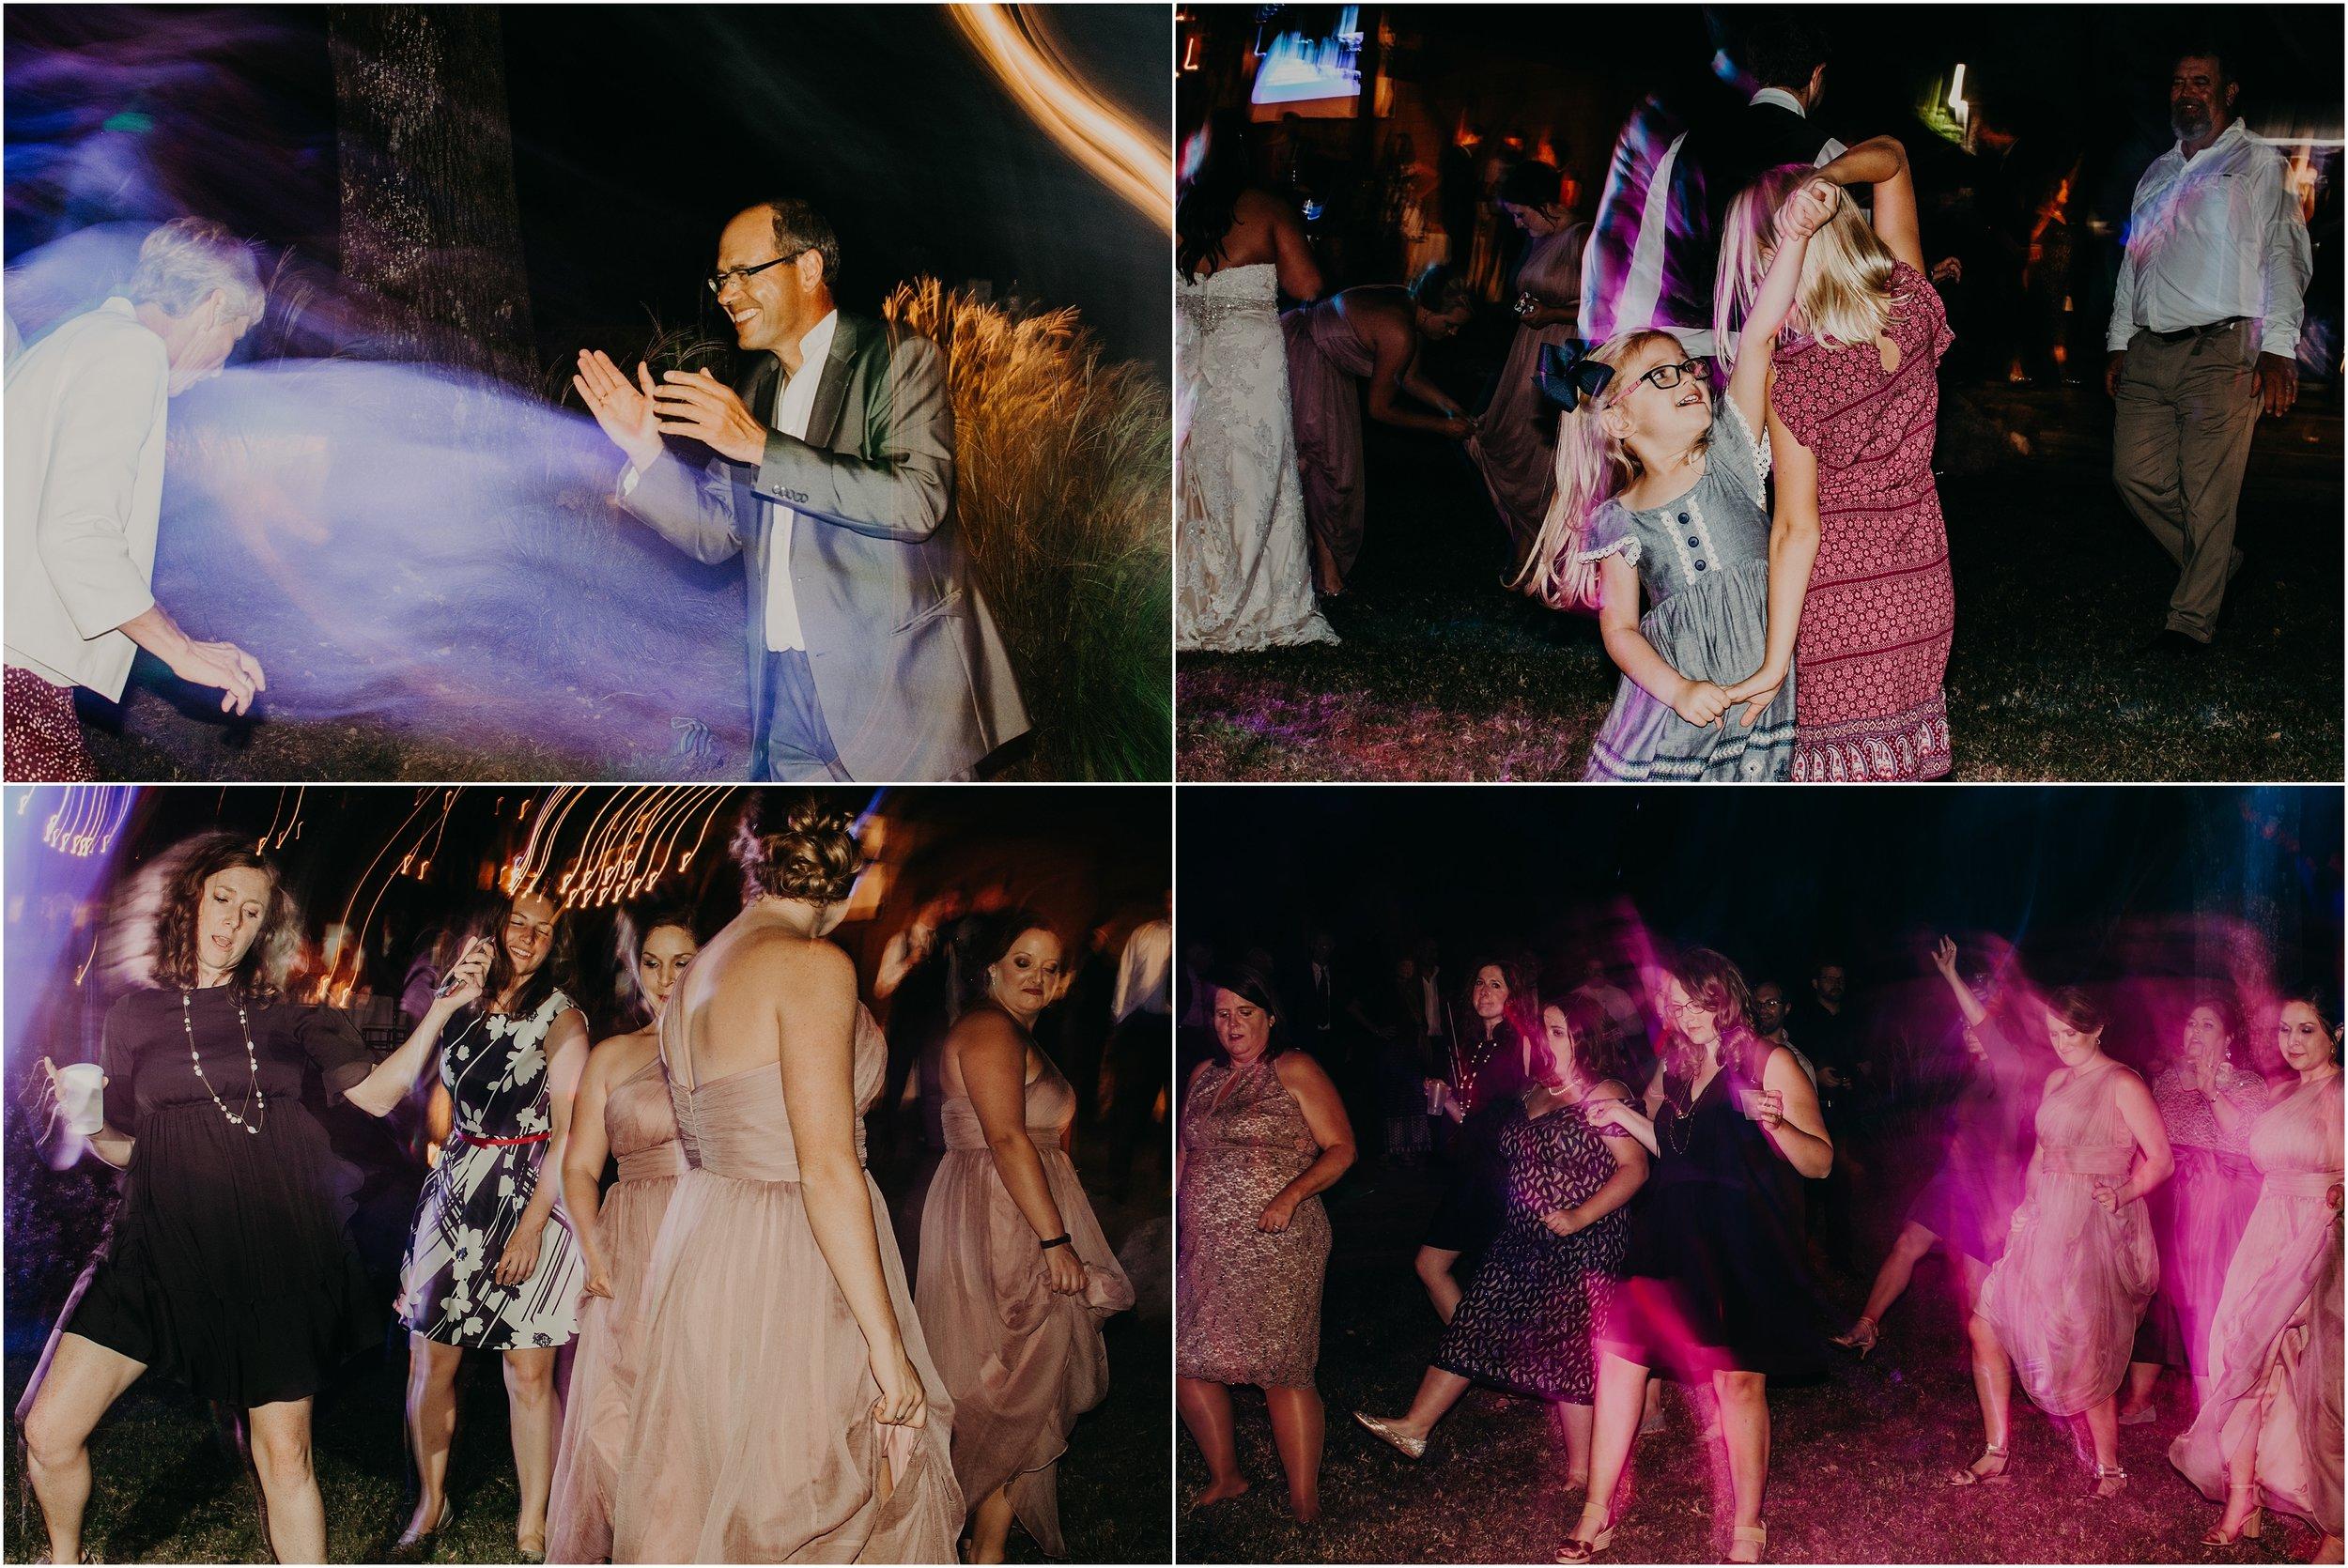 Slow shutter drag wedding reception images